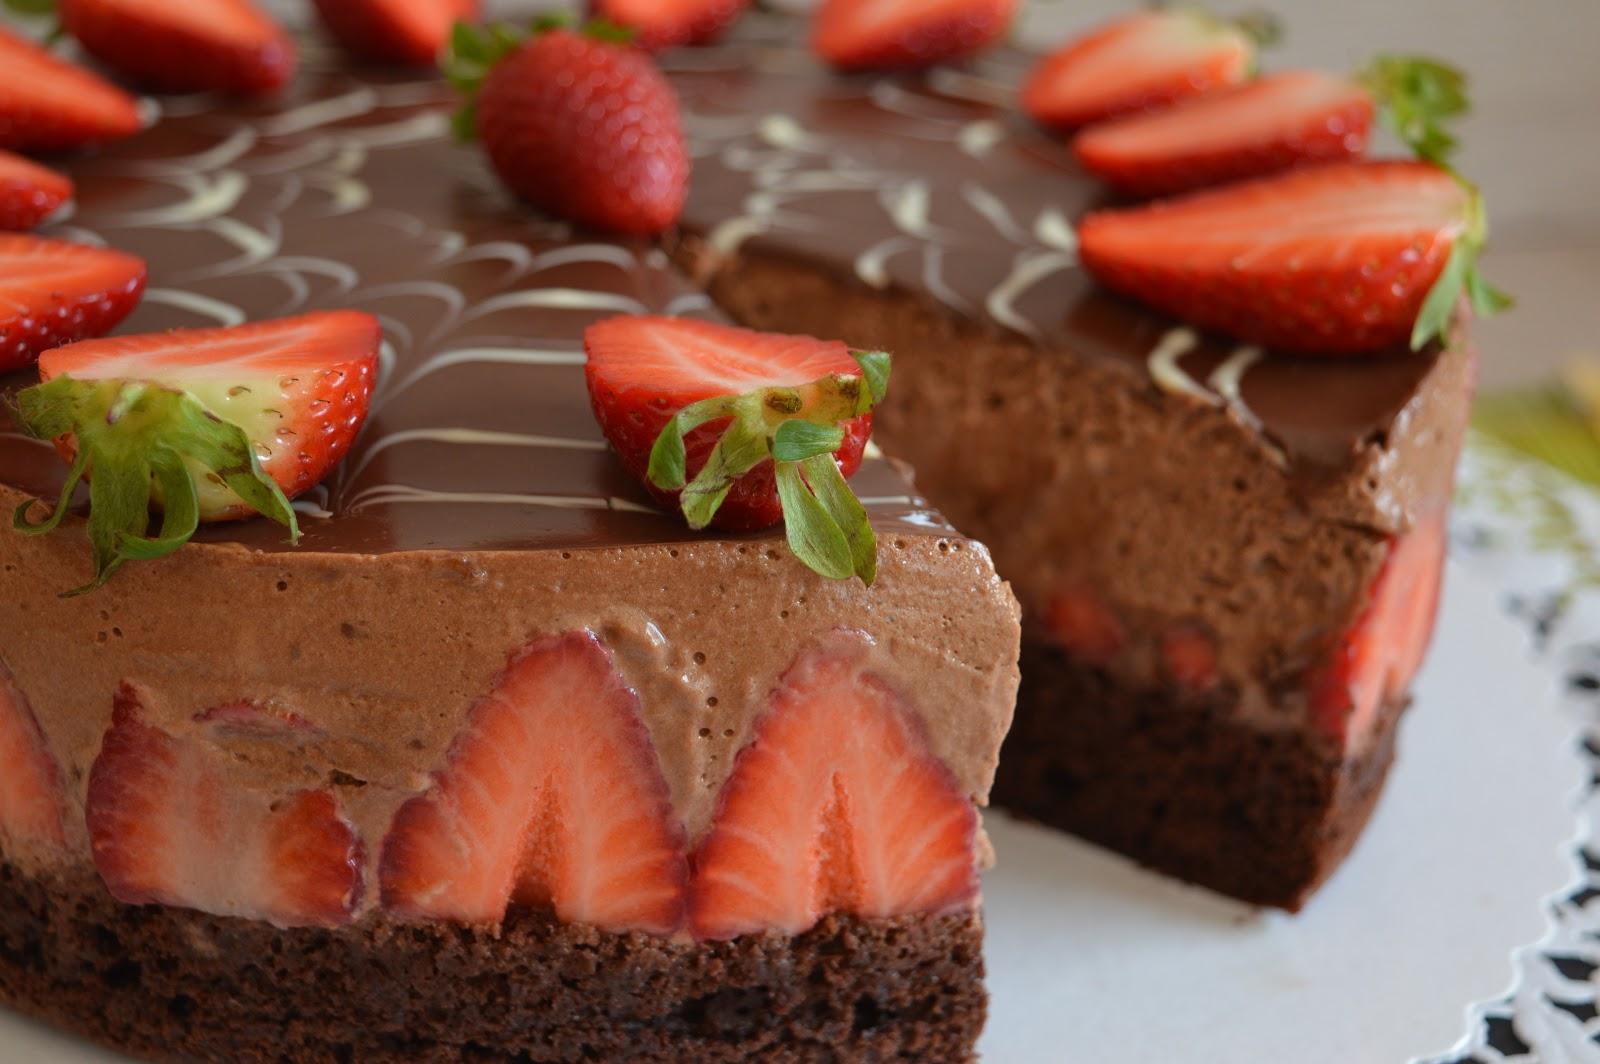 Julias Zuckersusse Kuchenwelt Schoko Erdbeer Mousse Torte